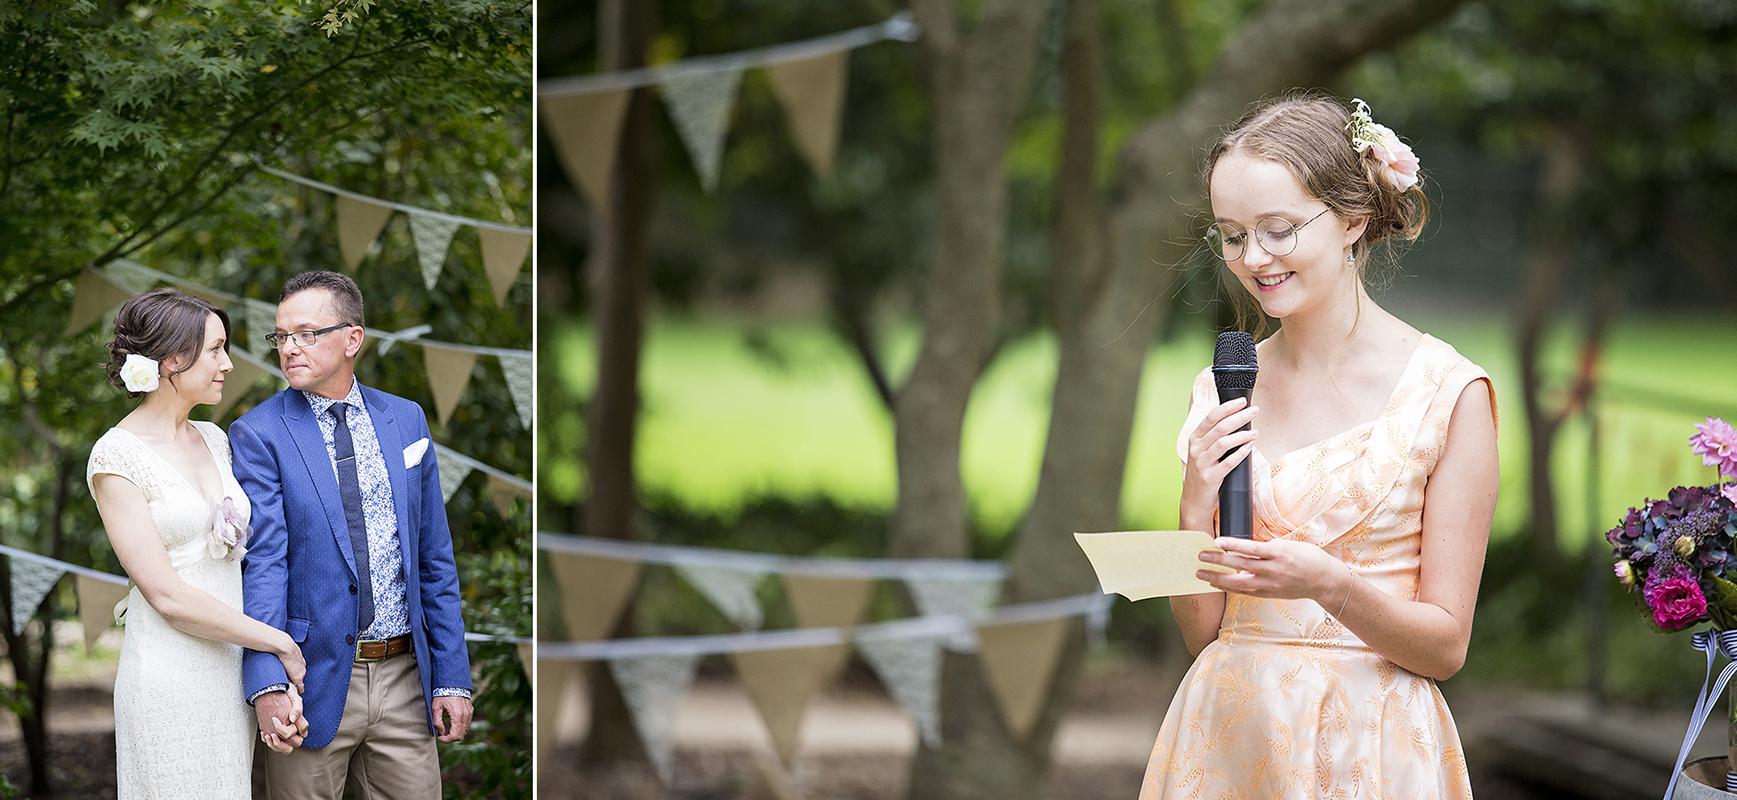 Stangate House Aldgate Wedding Photography 26.jpg